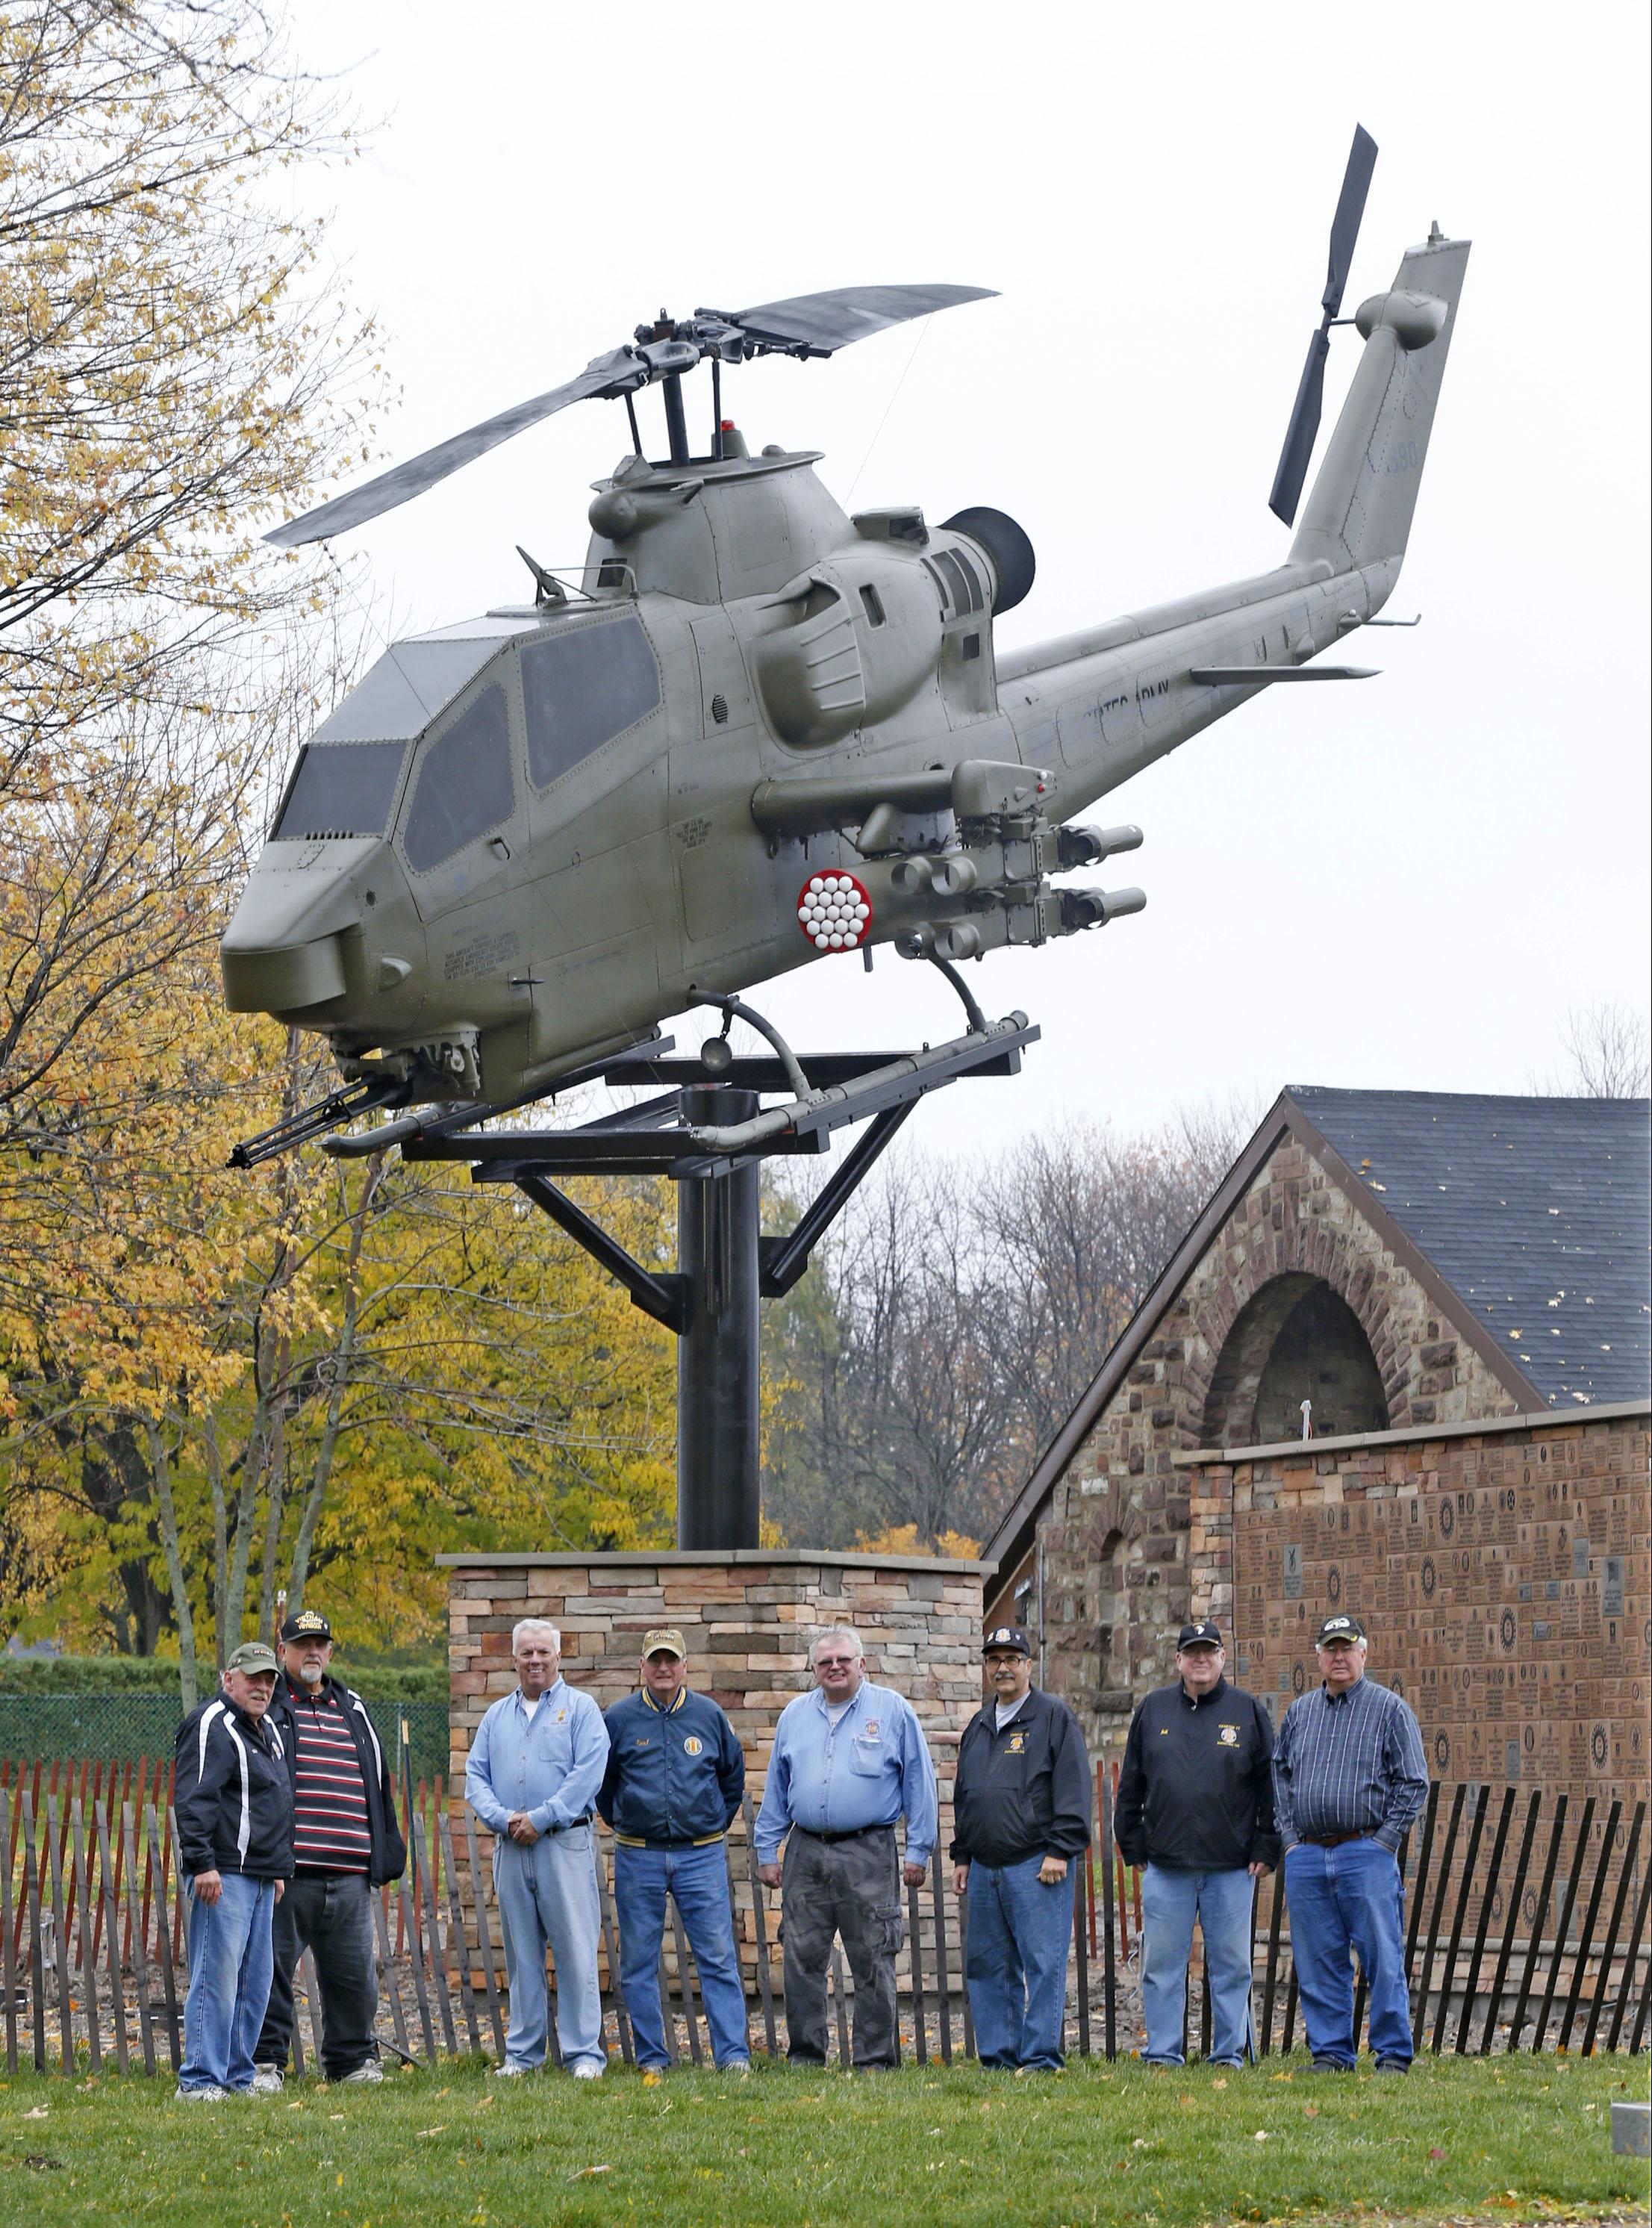 U.S. Army Vietnam War veterans stand near the 1972 Cobra helicopter that was erected in Veterans Park in the City of Tonawanda on Thursday, Nov. 3, 2016. From left are Michael Walker, Tom Thompson, Dan Brady, Paul Pietrowski, Ed Bodine, Pete DiVergilio, Bill St. Jean and Dennis Smilinich. (Robert Kirkham/Buffalo News)